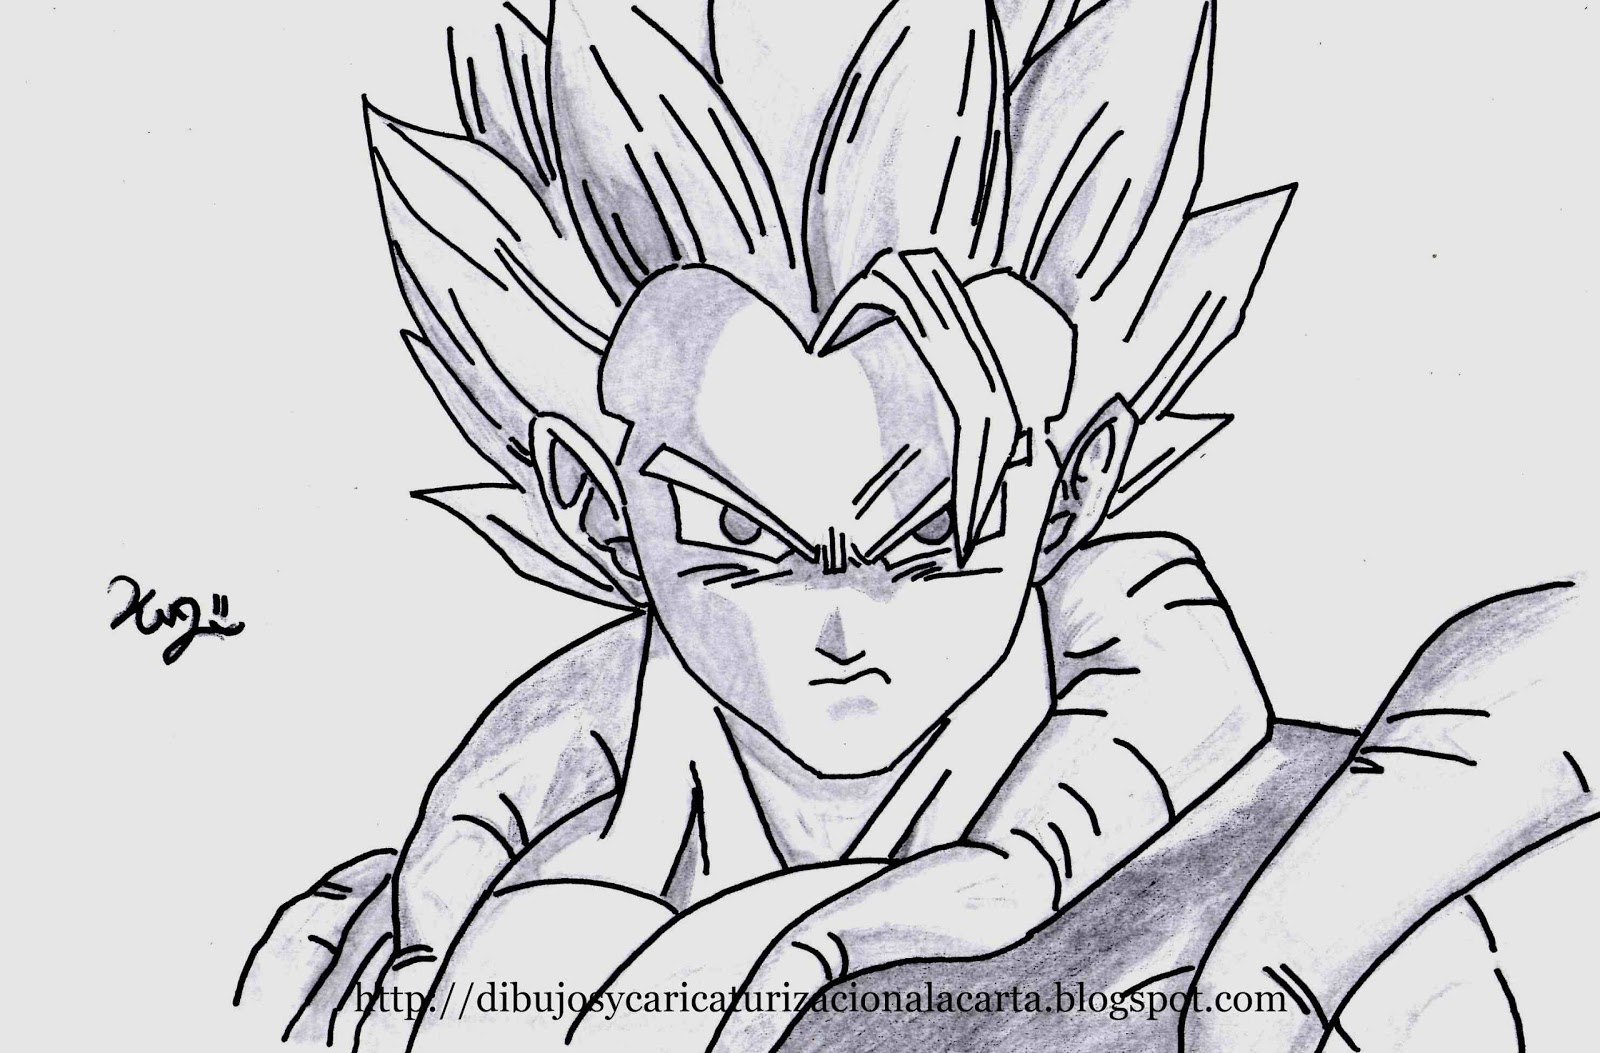 50 Imágenes De Goku Para Dibujar: Imagenesde99: Imagenes De Goku Faciles Para Dibujar